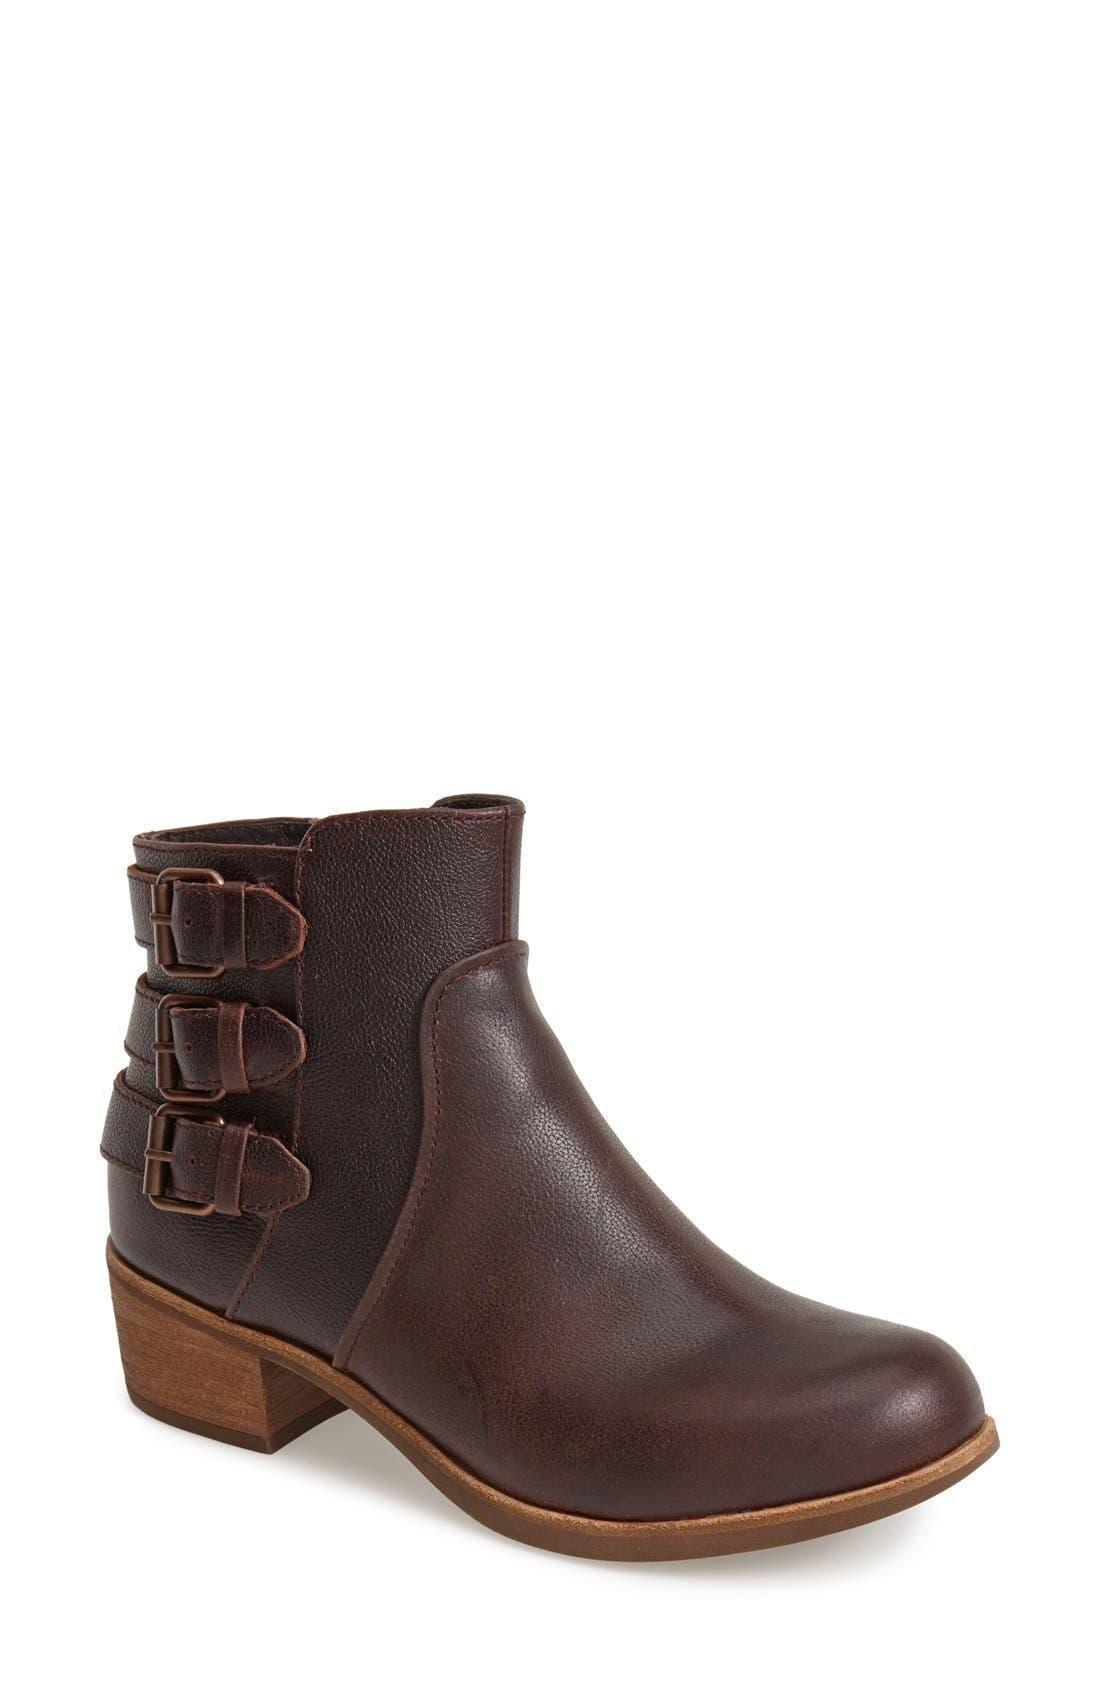 Main Image - UGG® Australia 'Volta' Leather Ankle Boot (Women)